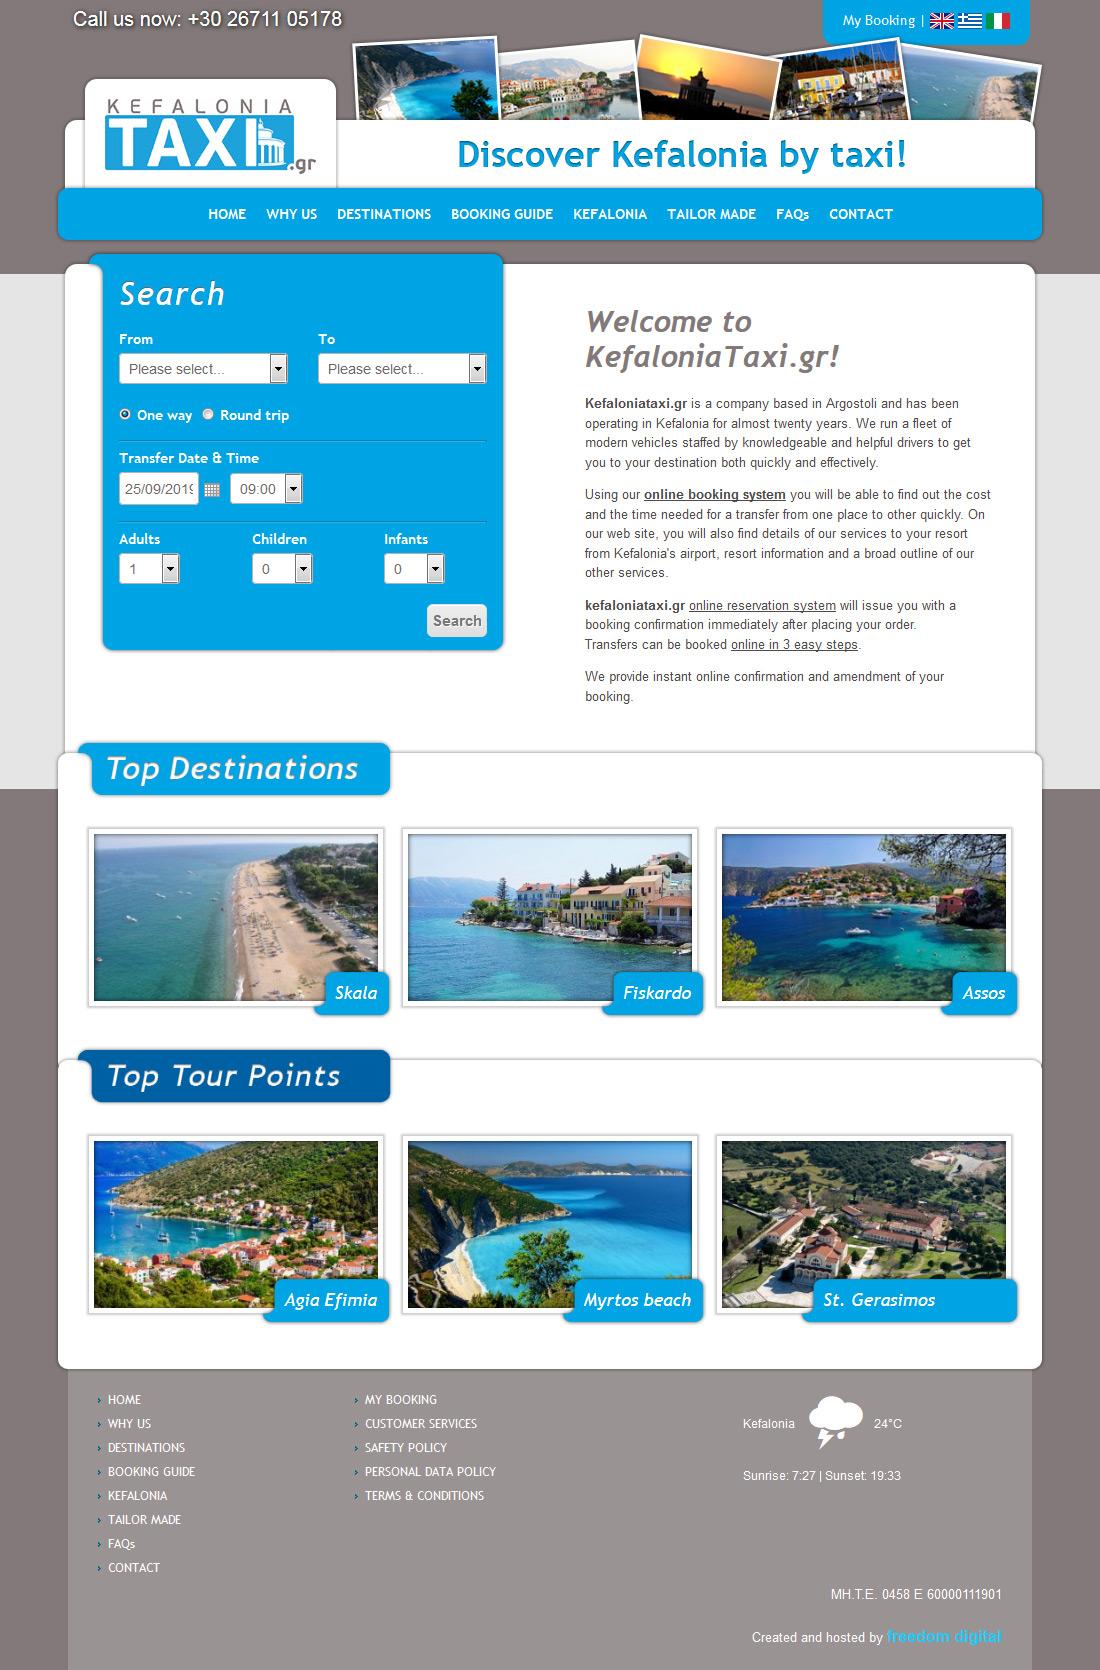 Kefalonia Taxi - Σχεδιασμός & Κατασκευή Ιστοσελίδας